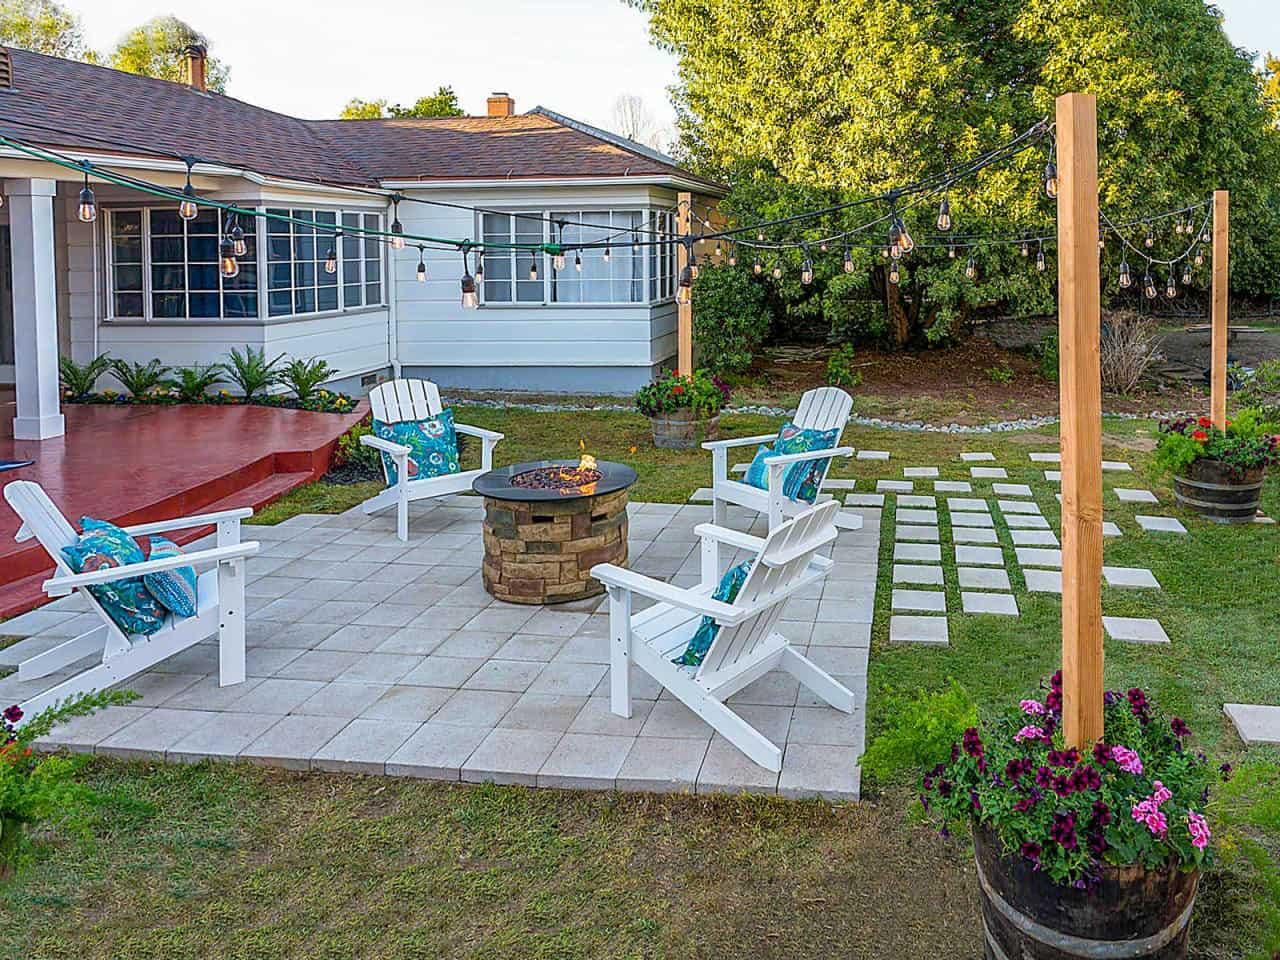 20 Amazing Backyard String Light Ideas For A Dreamy Ambiance on Backyard String Light Designs id=68009